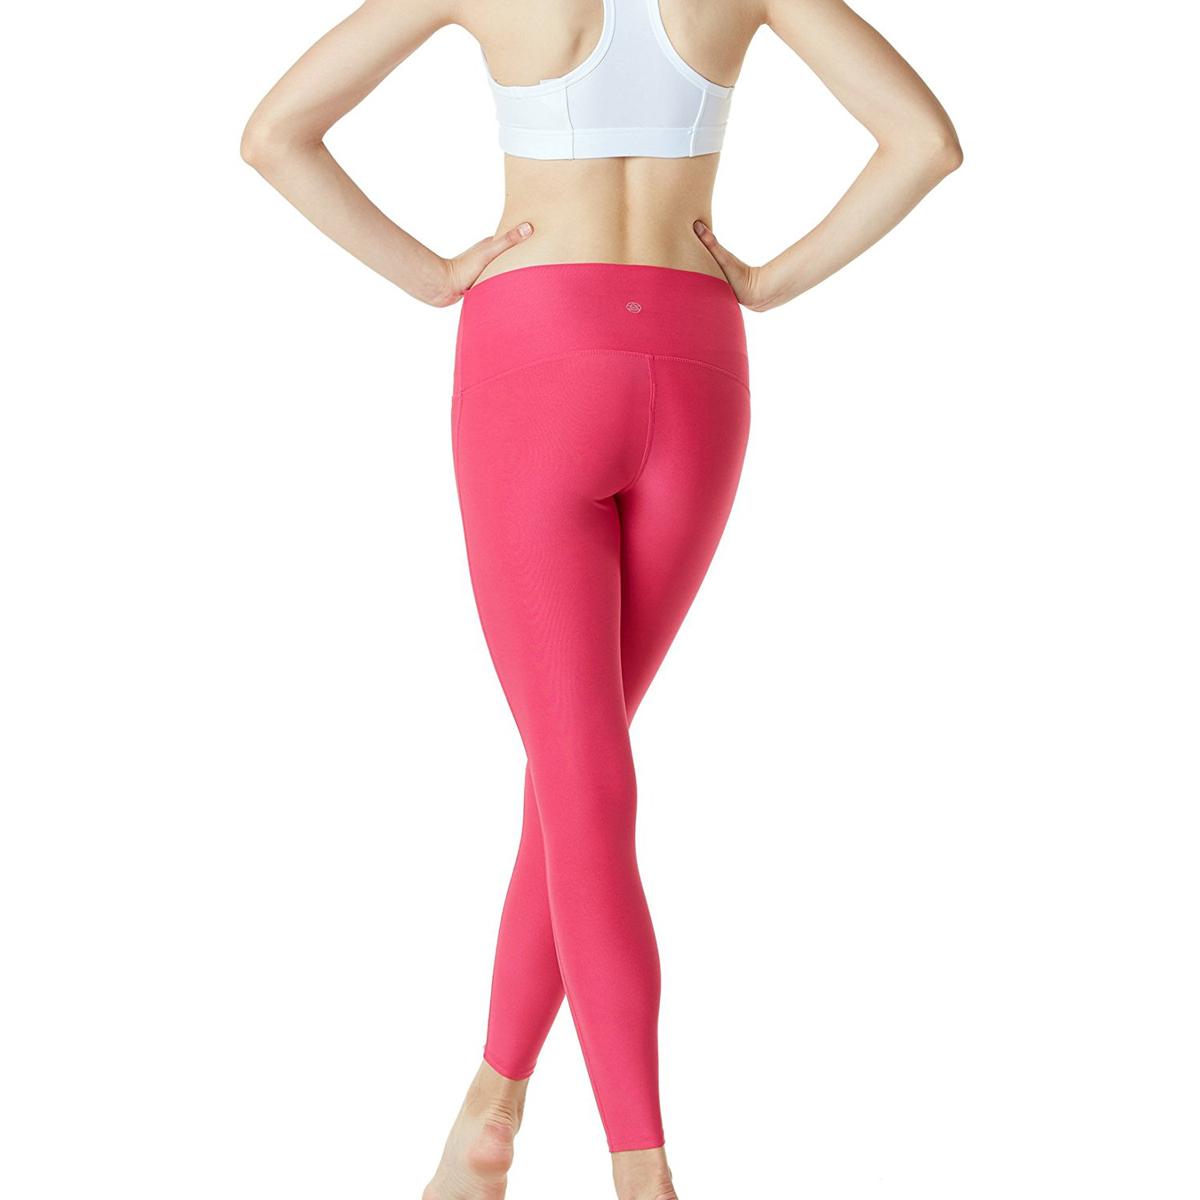 thumbnail 42 - TSLA Tesla FYP42 Women's High-Waisted Ultra-Stretch Tummy Control Yoga Pants